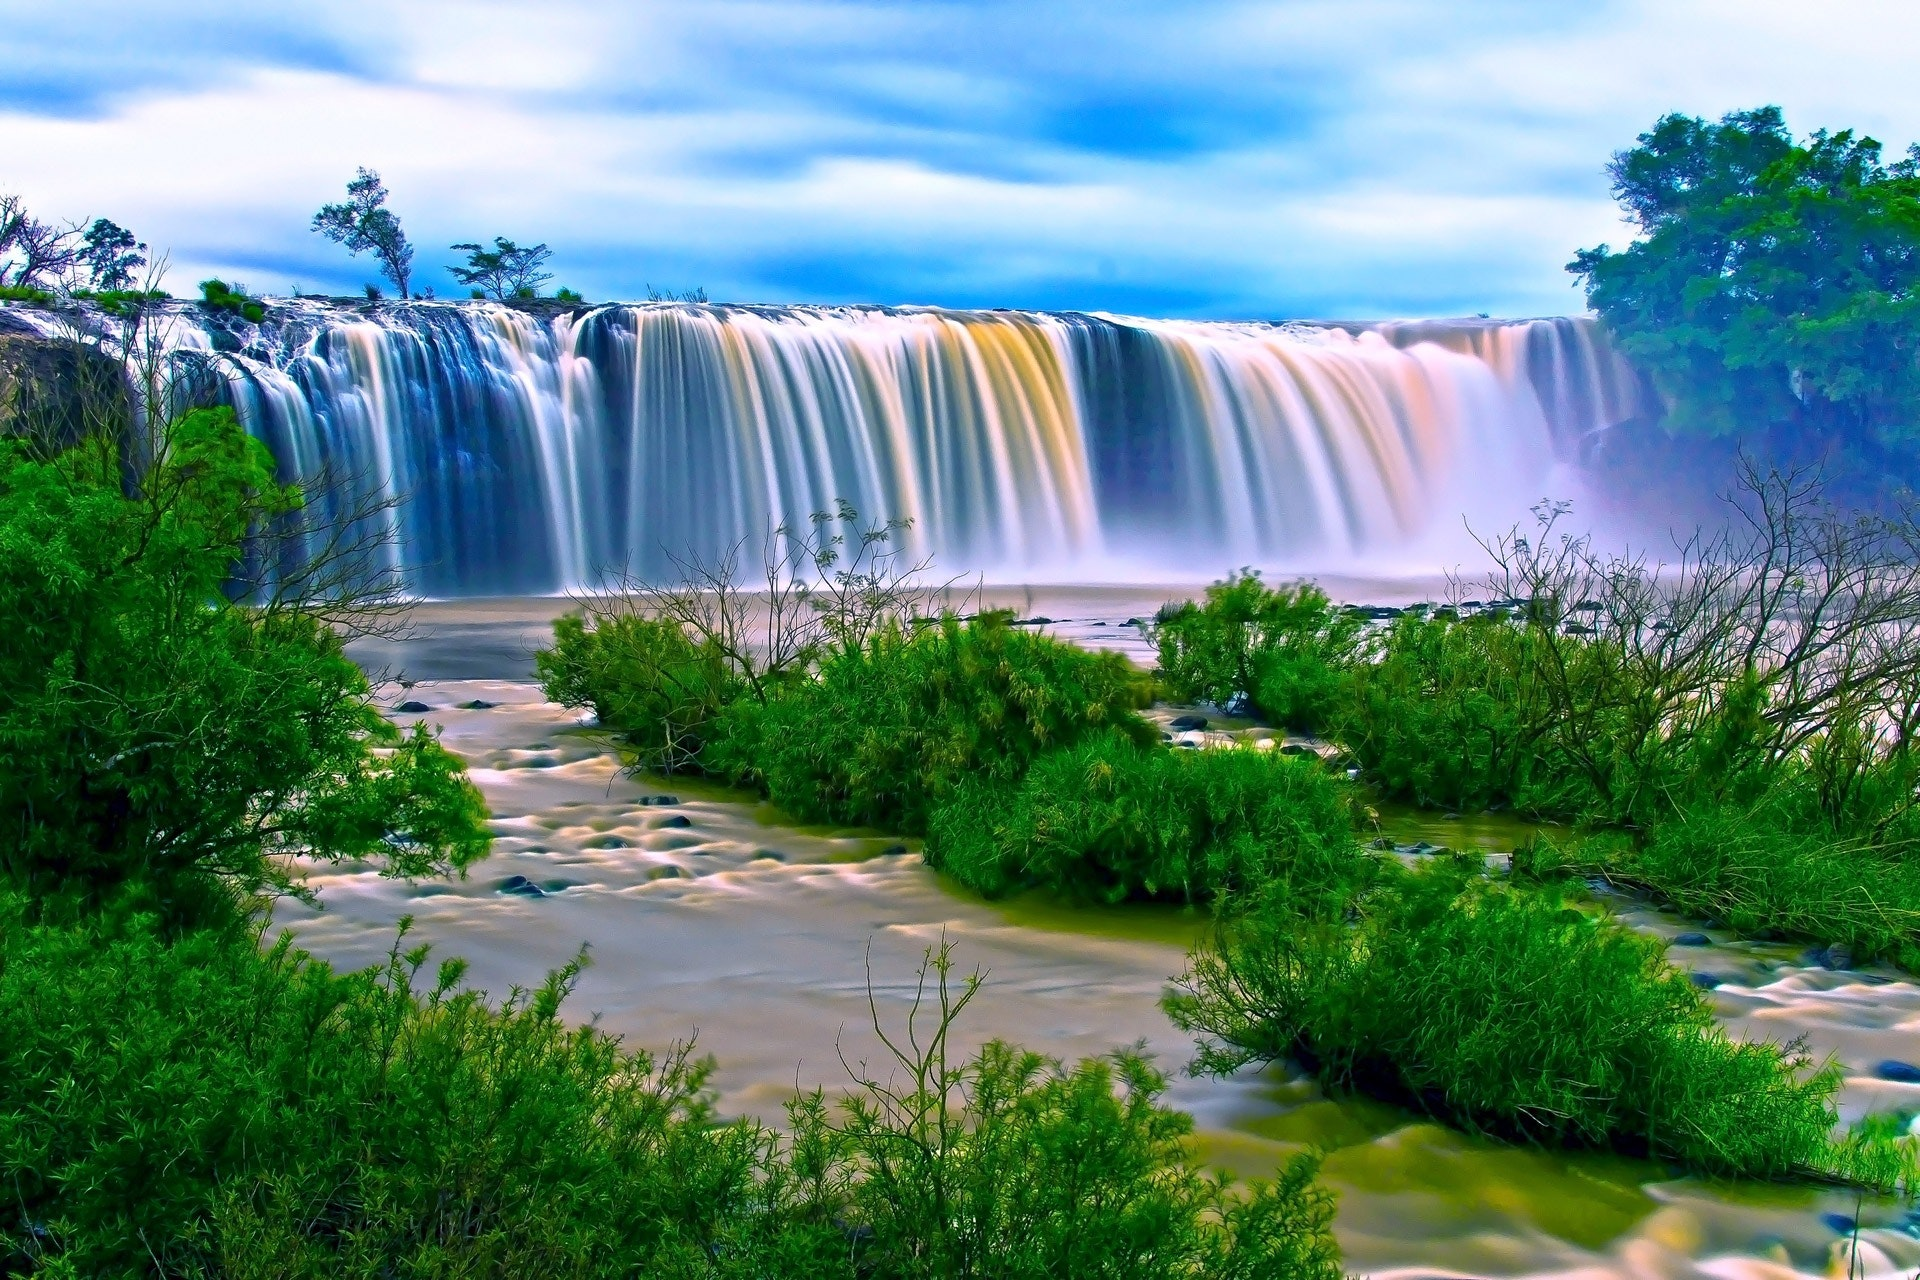 Natur Wallpaper Hintergrundbilder Pexels Kostenlose Stock Fotos